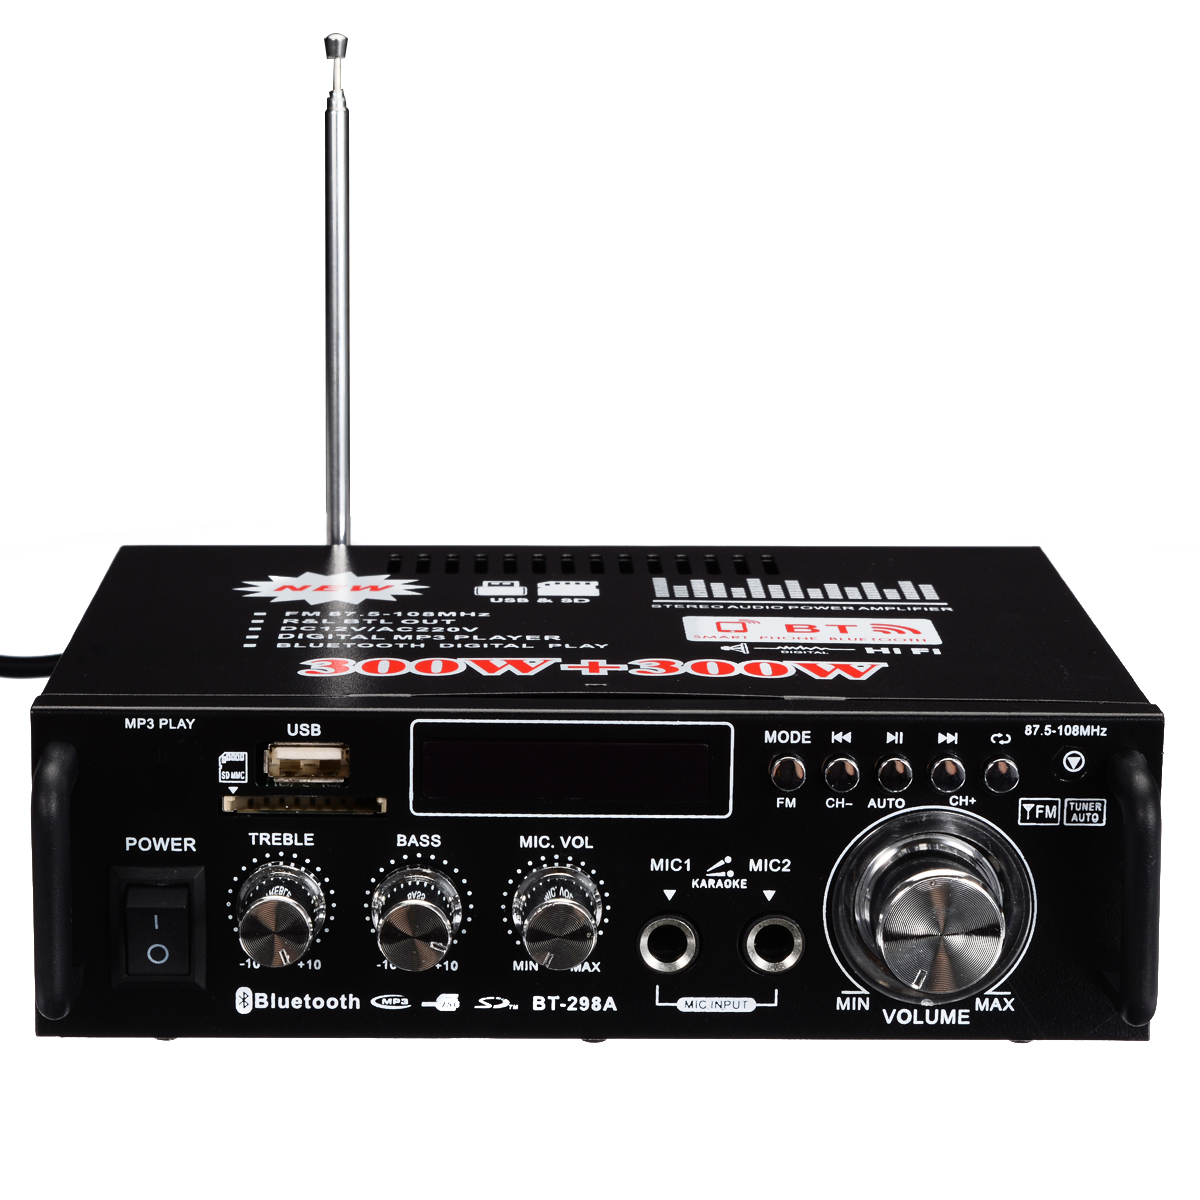 Mini Digital Audio เครื่องขยายเสียง 600 W ไฮไฟสเตอริโอบลูทูธสเตอริโอ Power Amplifiers FM USB SD สำหรับรถบ้านรีโมทคอนโทรล-ใน เครื่องขยายเสียง จาก อุปกรณ์อิเล็กทรอนิกส์ บน AliExpress - 11.11_สิบเอ็ด สิบเอ็ดวันคนโสด 1